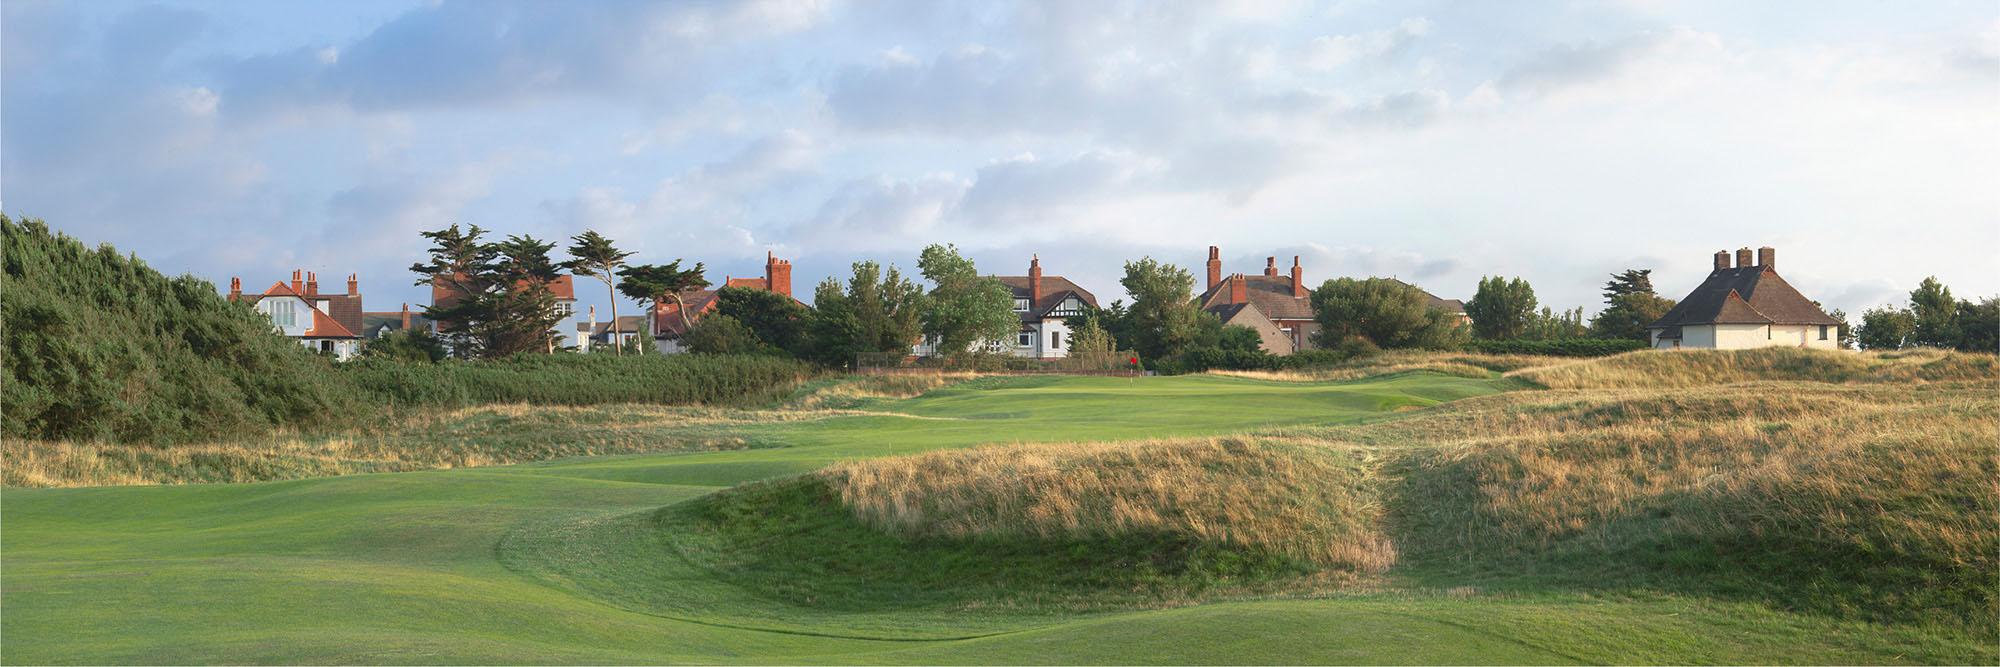 Golf Course Image - Royal Liverpool No.8